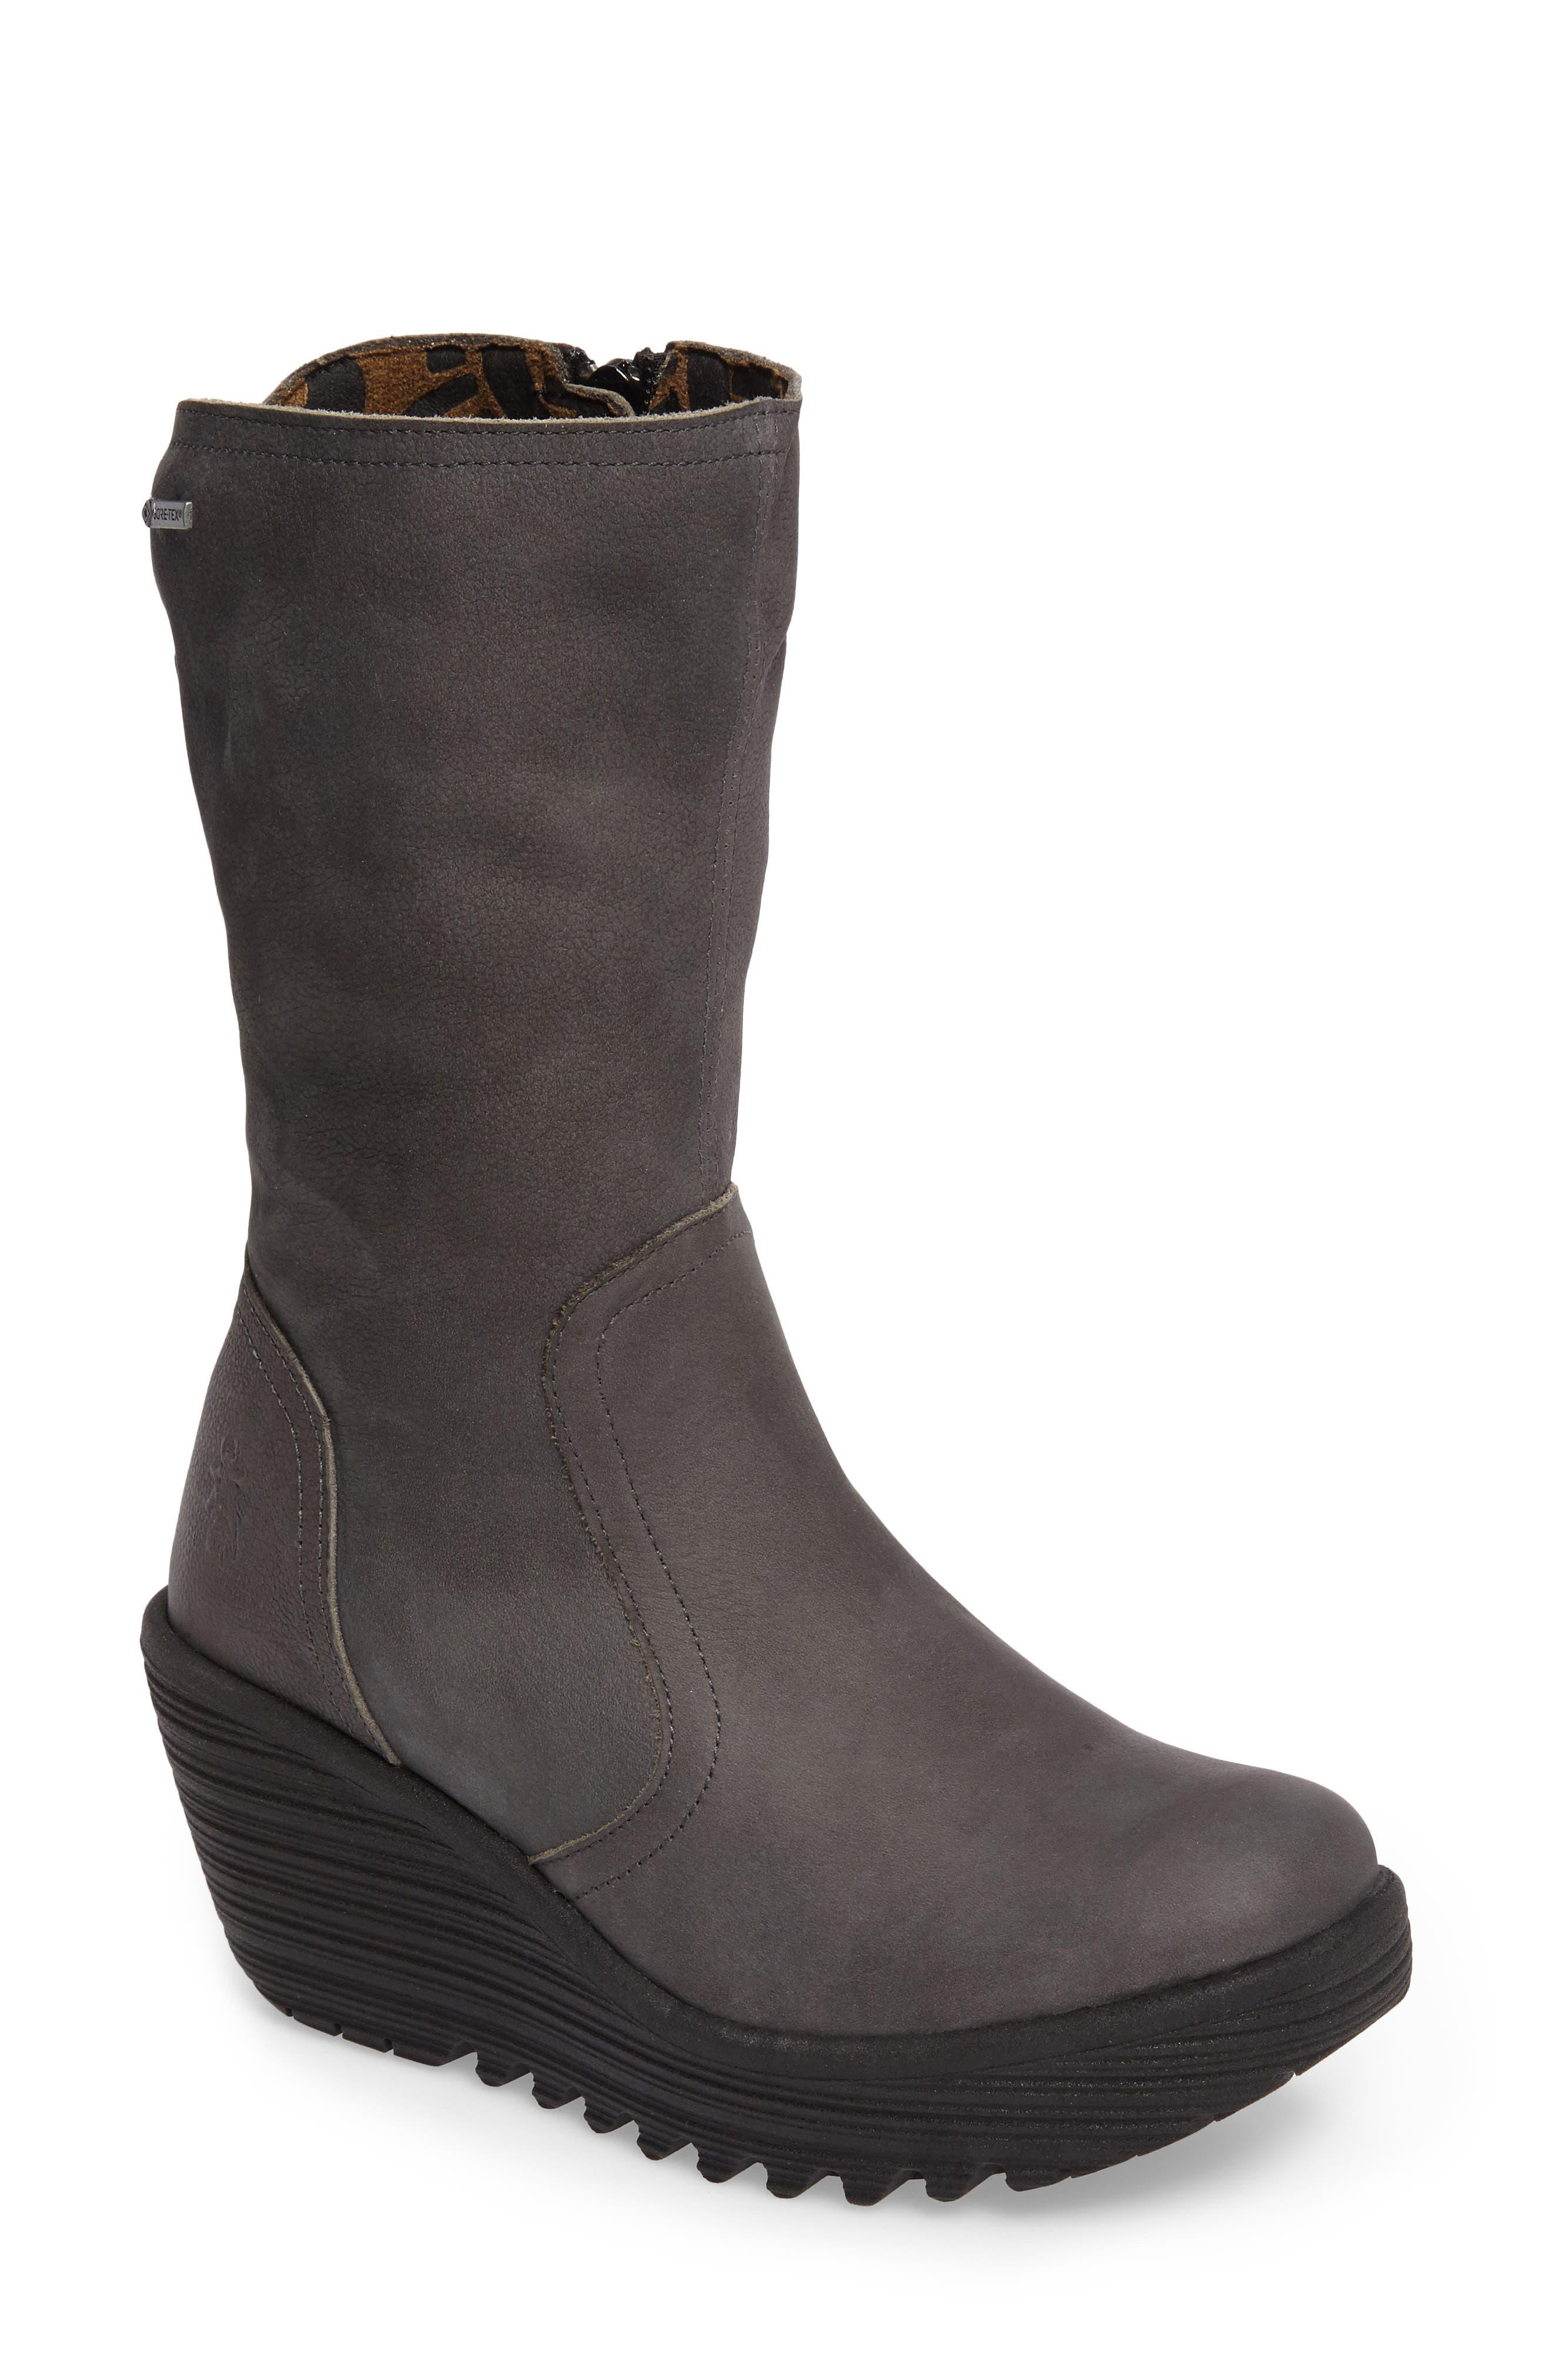 Alternate Image 1 Selected - Fly London Yups Waterproof Gore-Tex® Wedge Boot (Women)